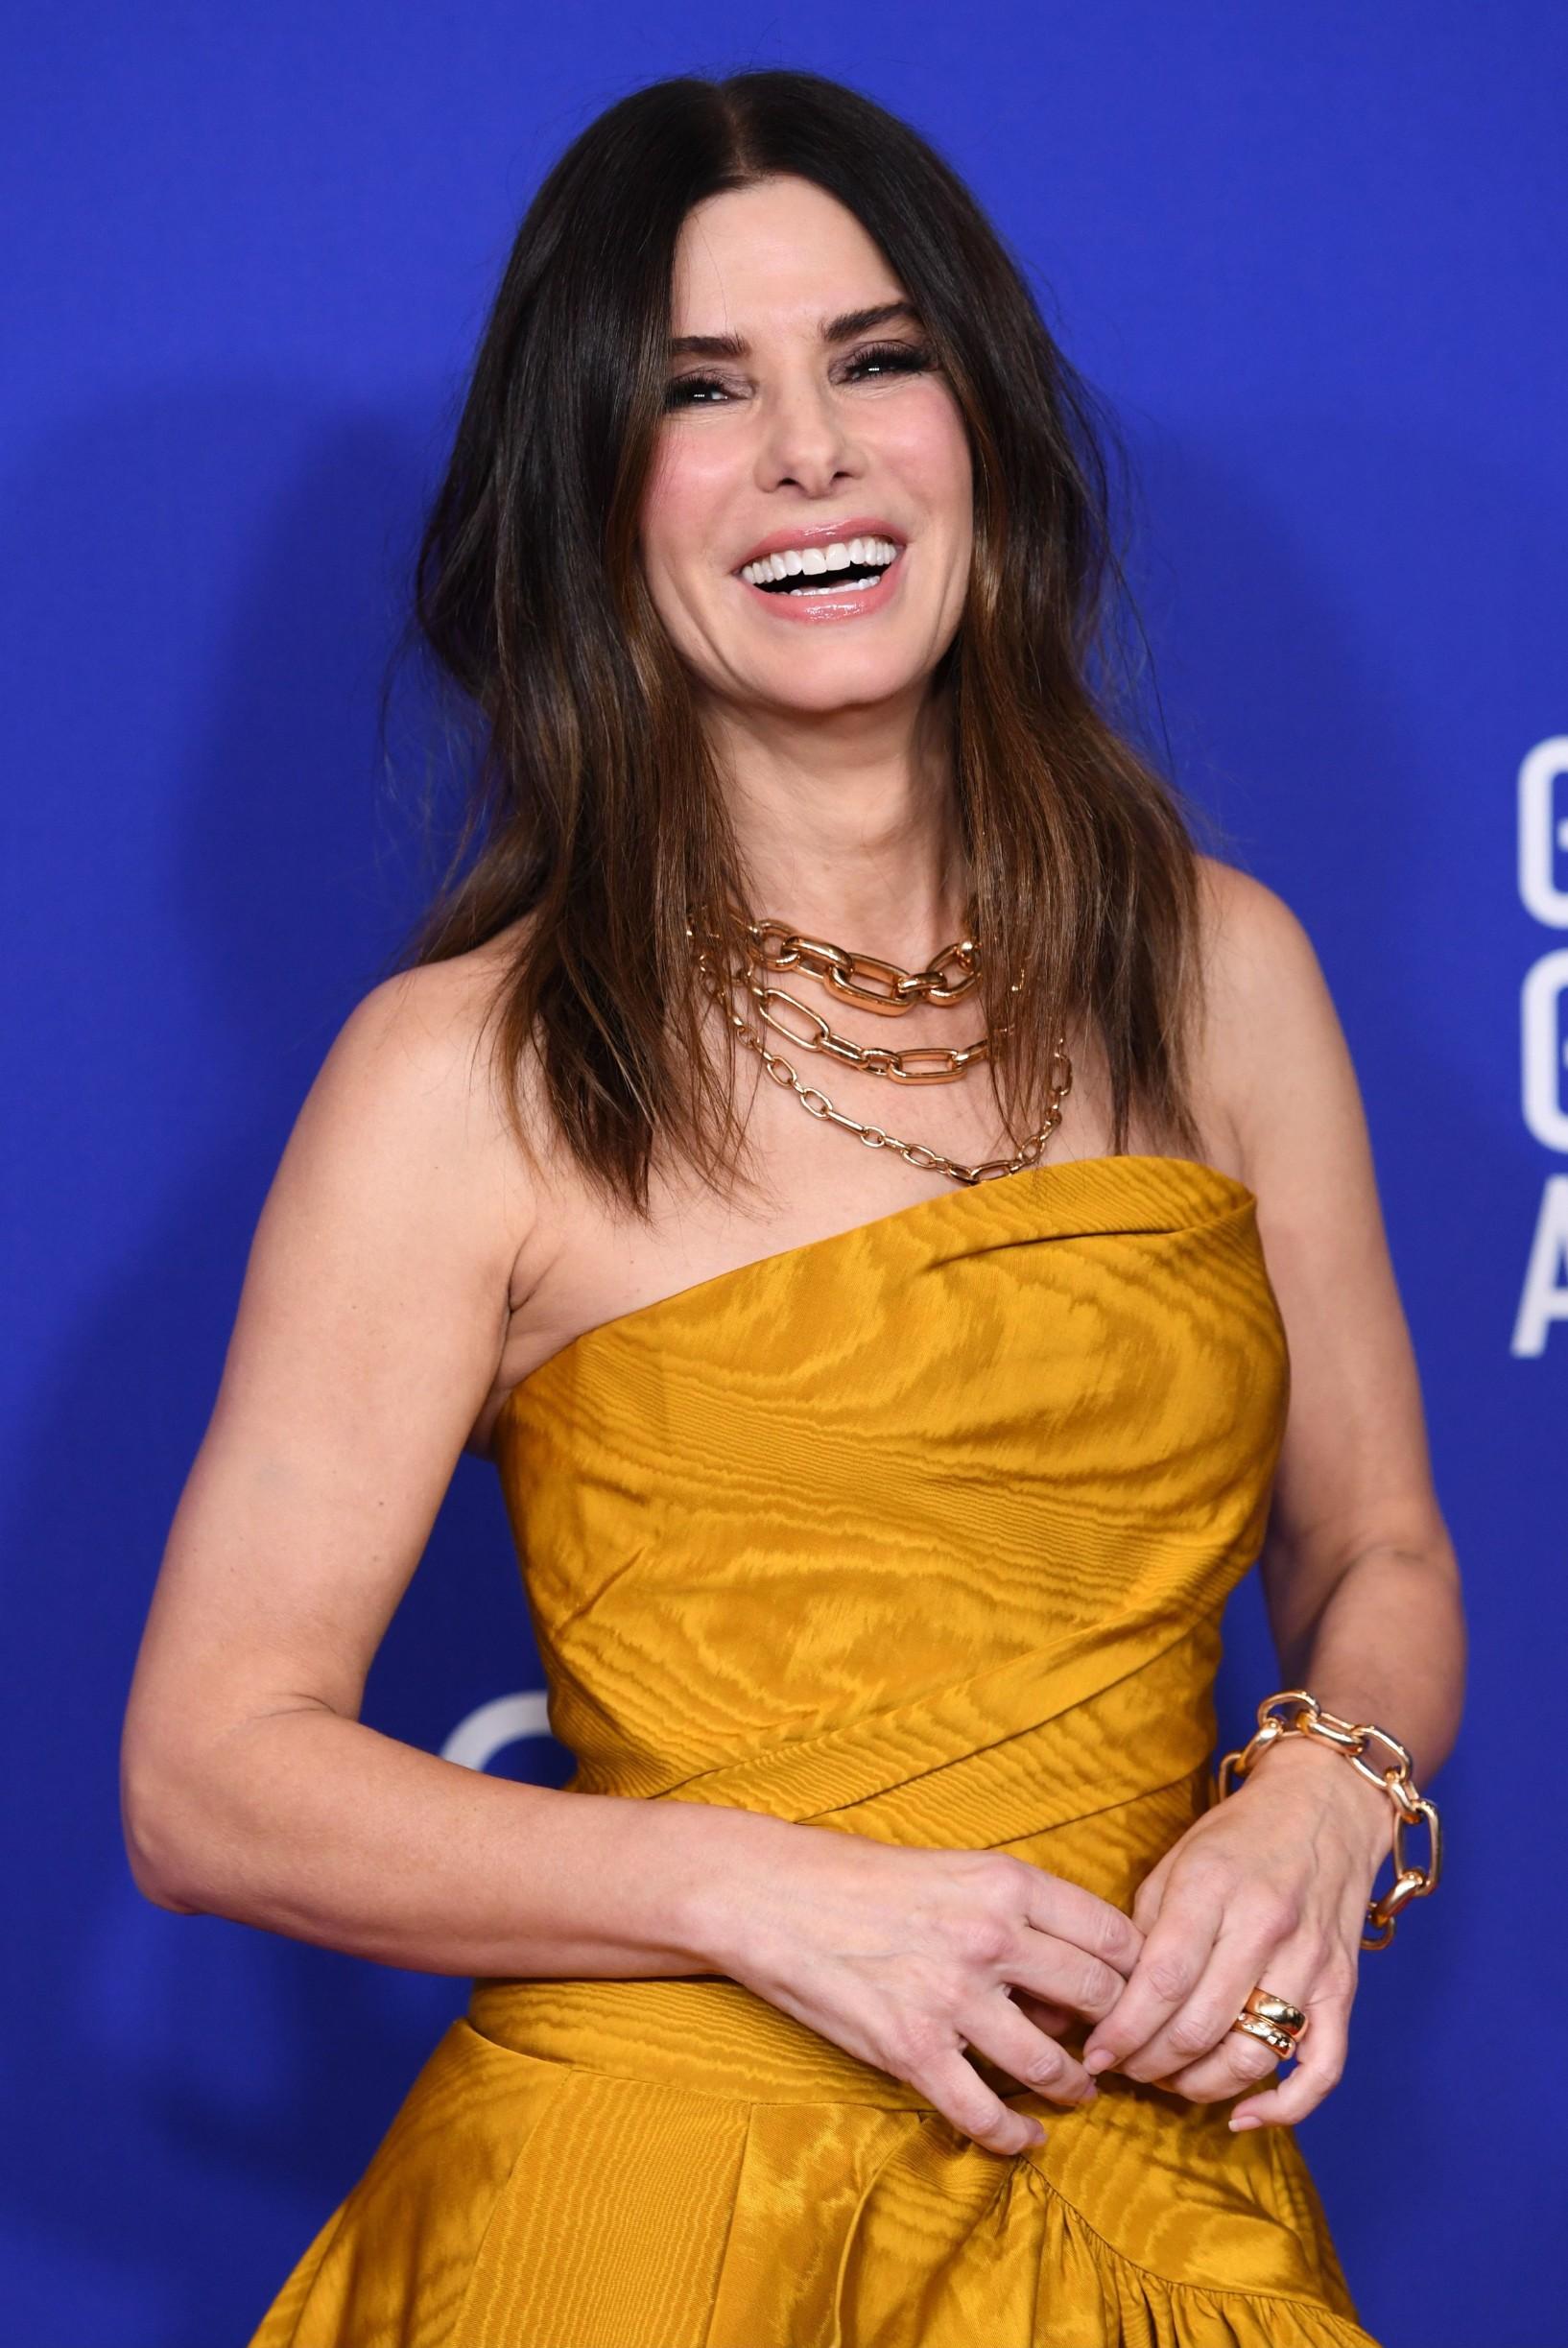 Sandra Bullock 77th Annual Golden Globe Awards, Press Room, Los Angeles, USA - 05 Jan 2020, Image: 491217080, License: Rights-managed, Restrictions: , Model Release: no, Credit line: REX / Shutterstock Editorial / Profimedia